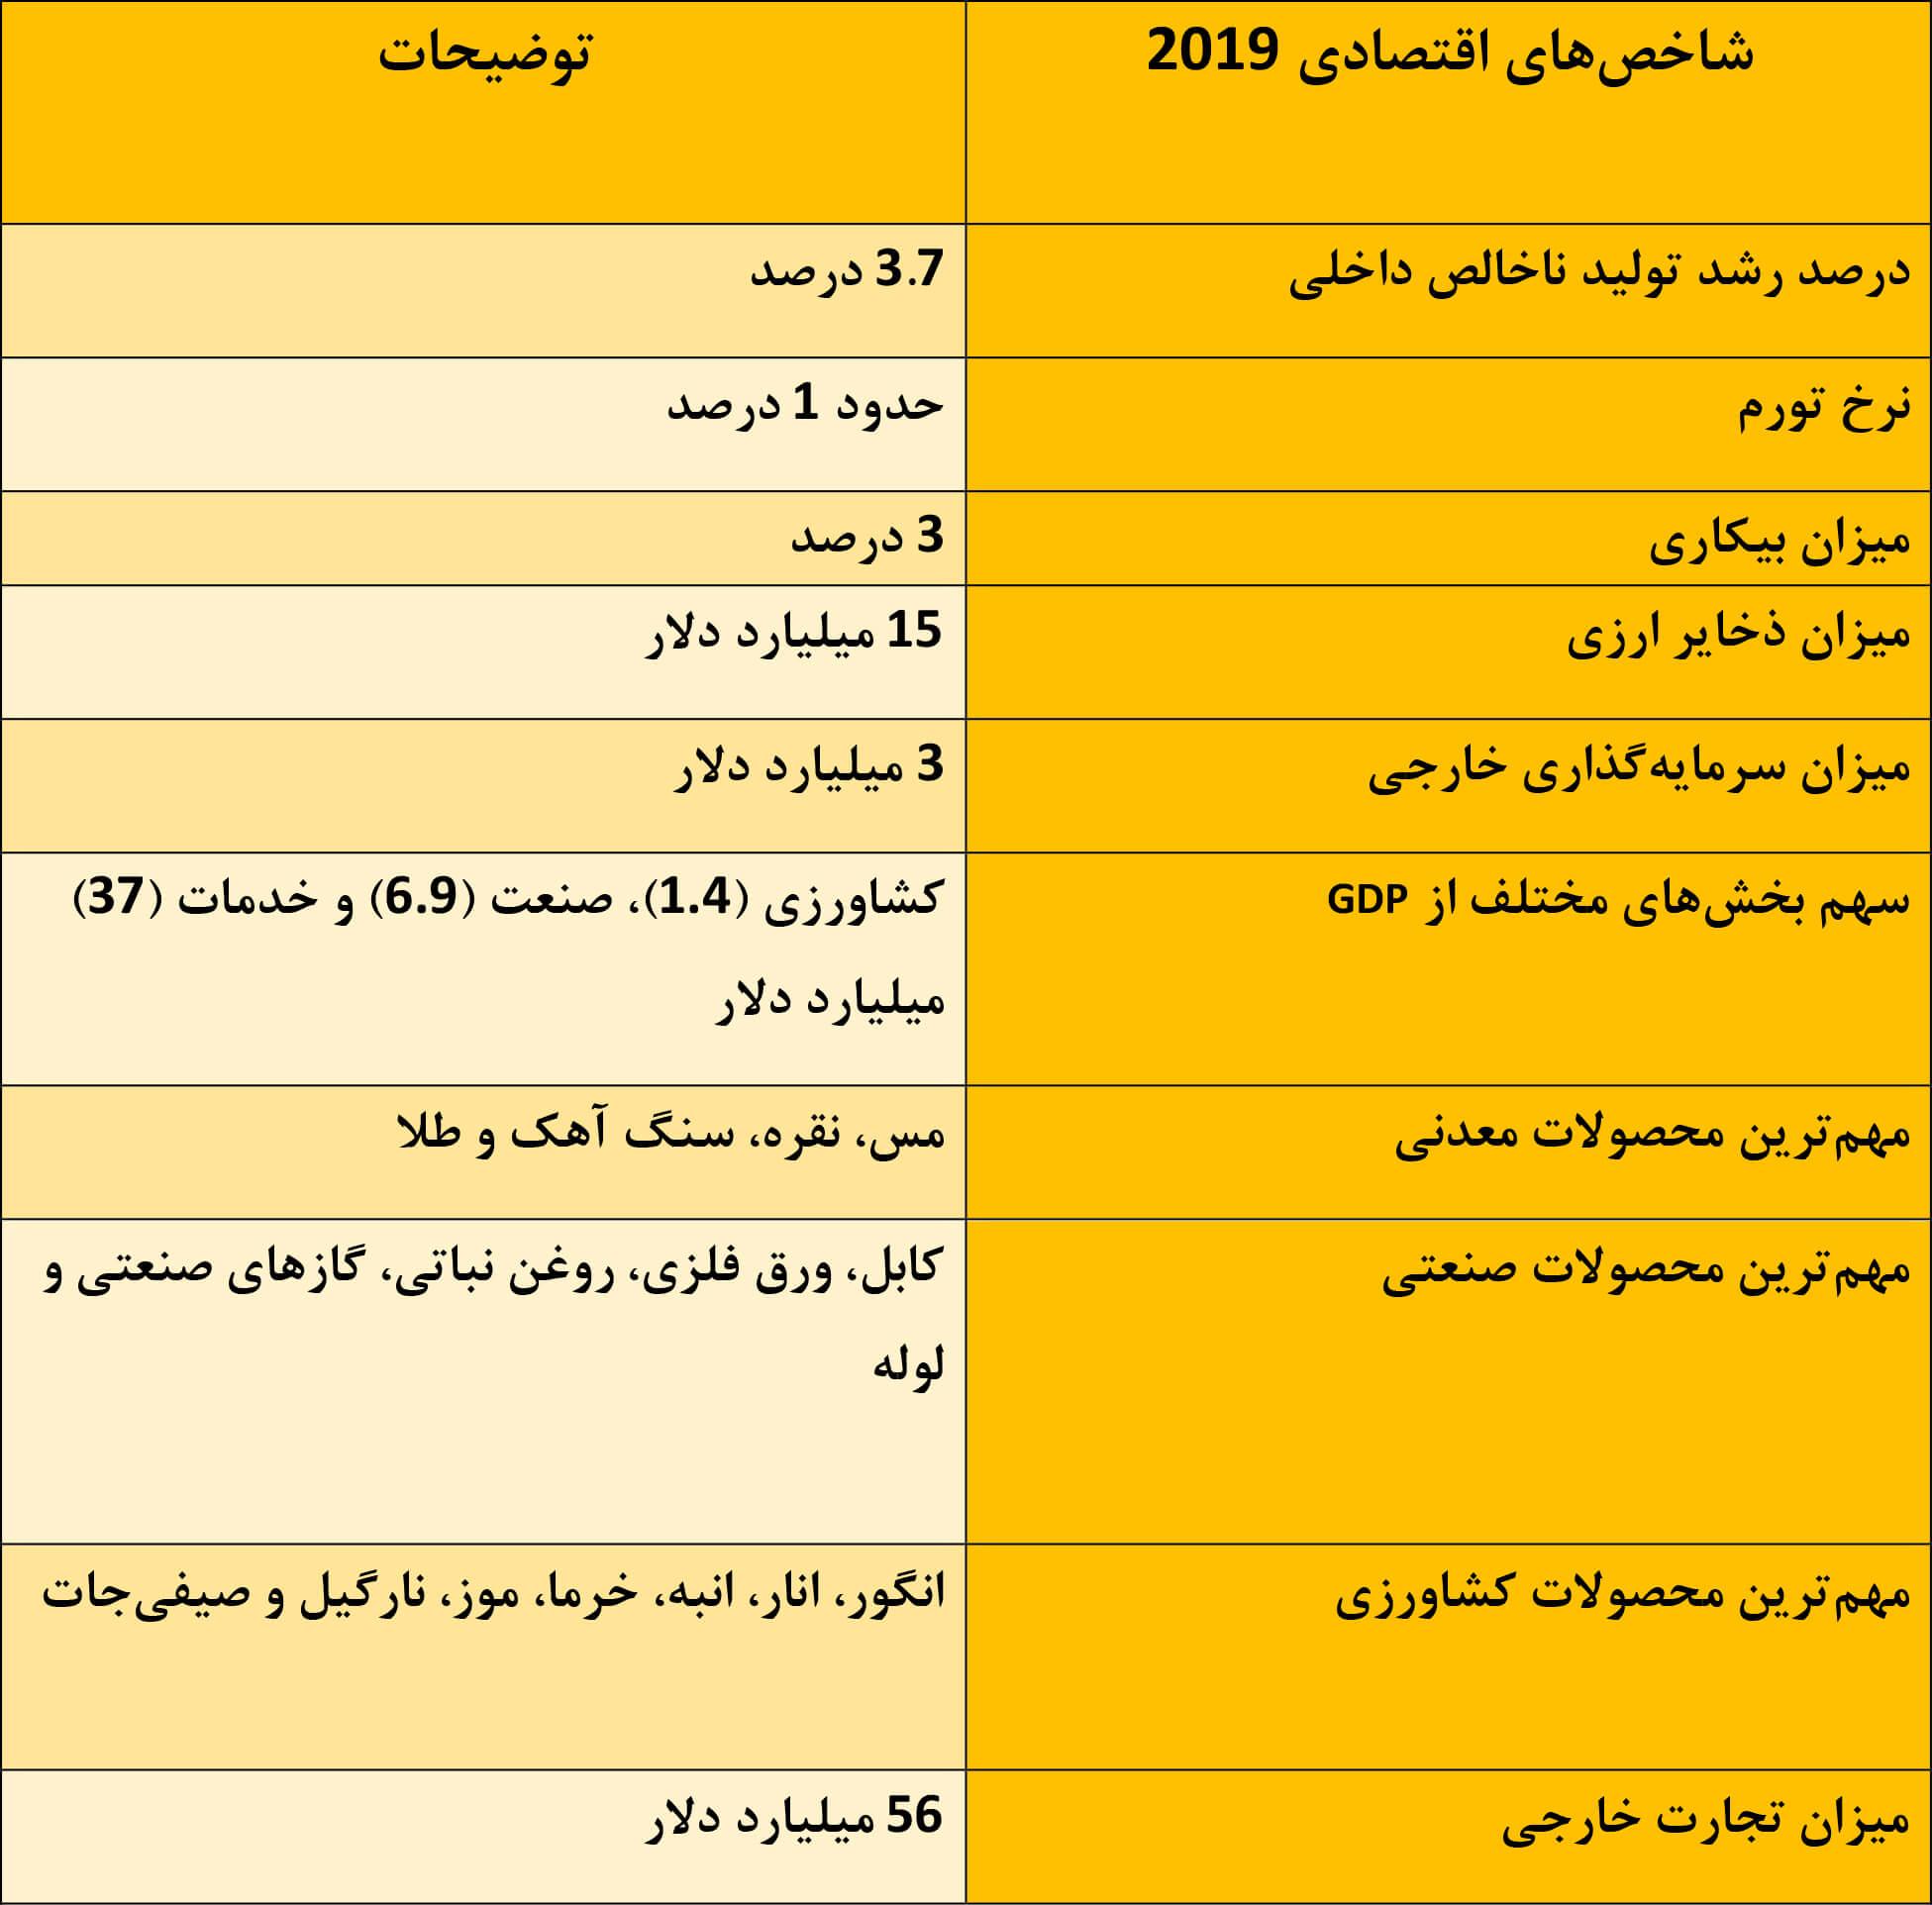 اقتصاد کشور عمان